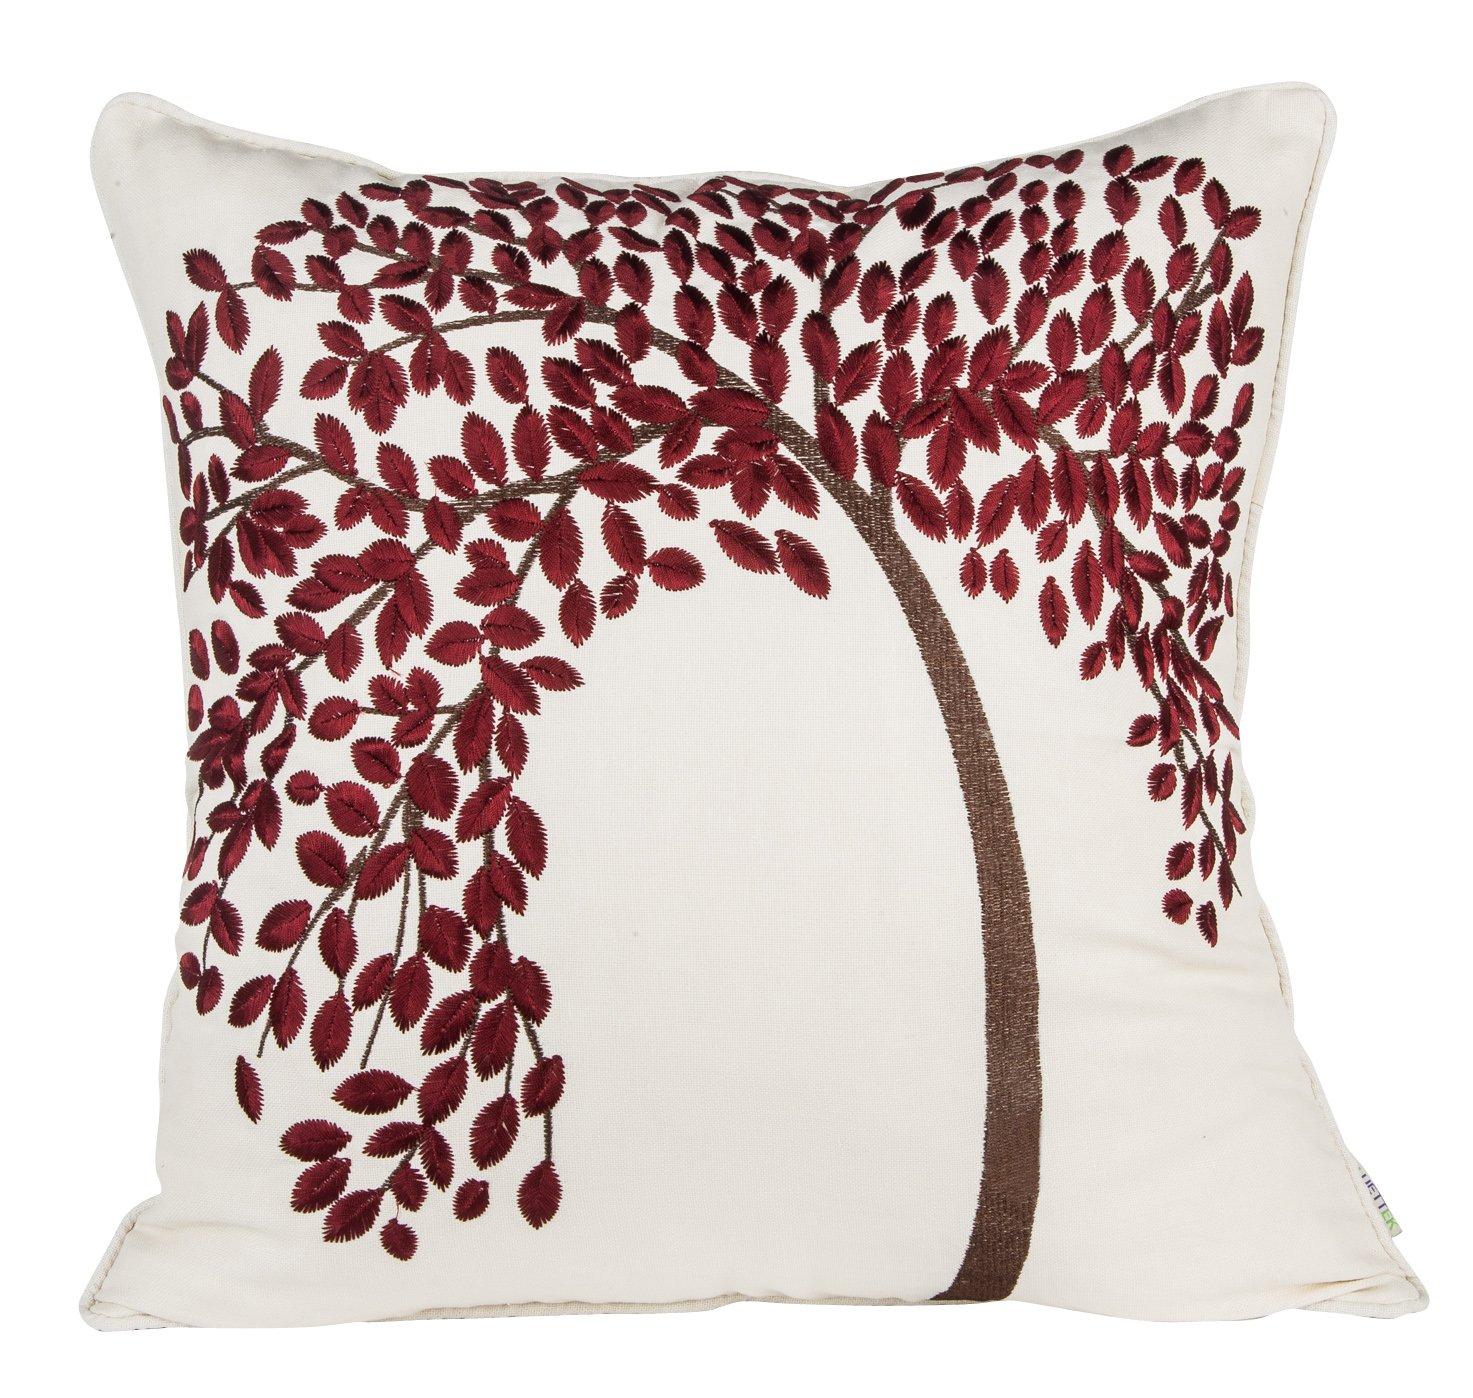 "Amazon BLUETTEK 18"" X 18"" Embroidered Cotton Linen"